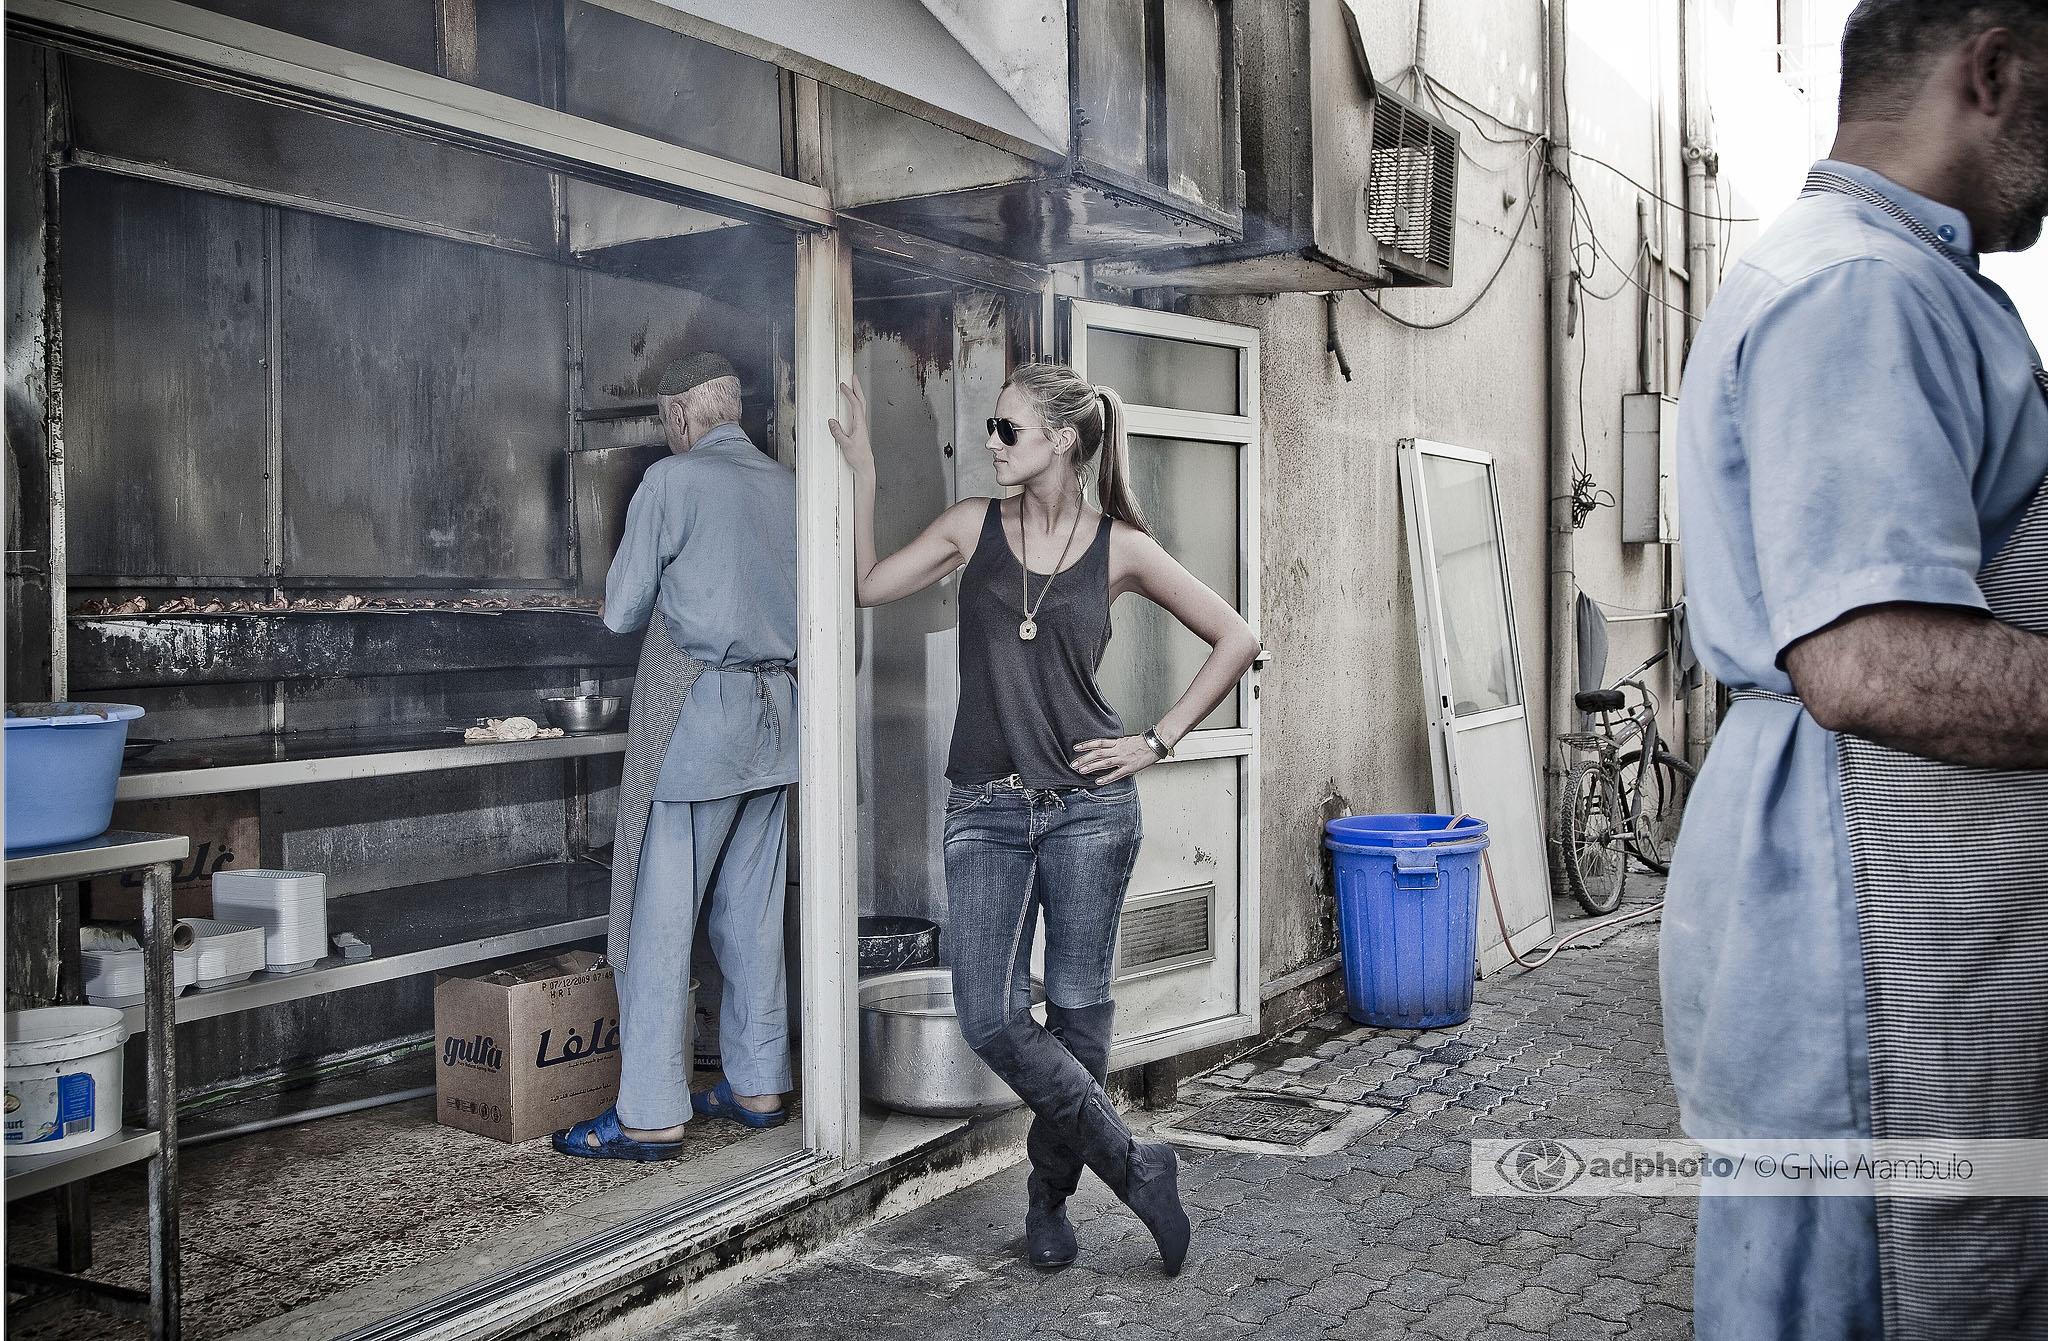 Fashion_G-Nie Arambulo_2.jpg